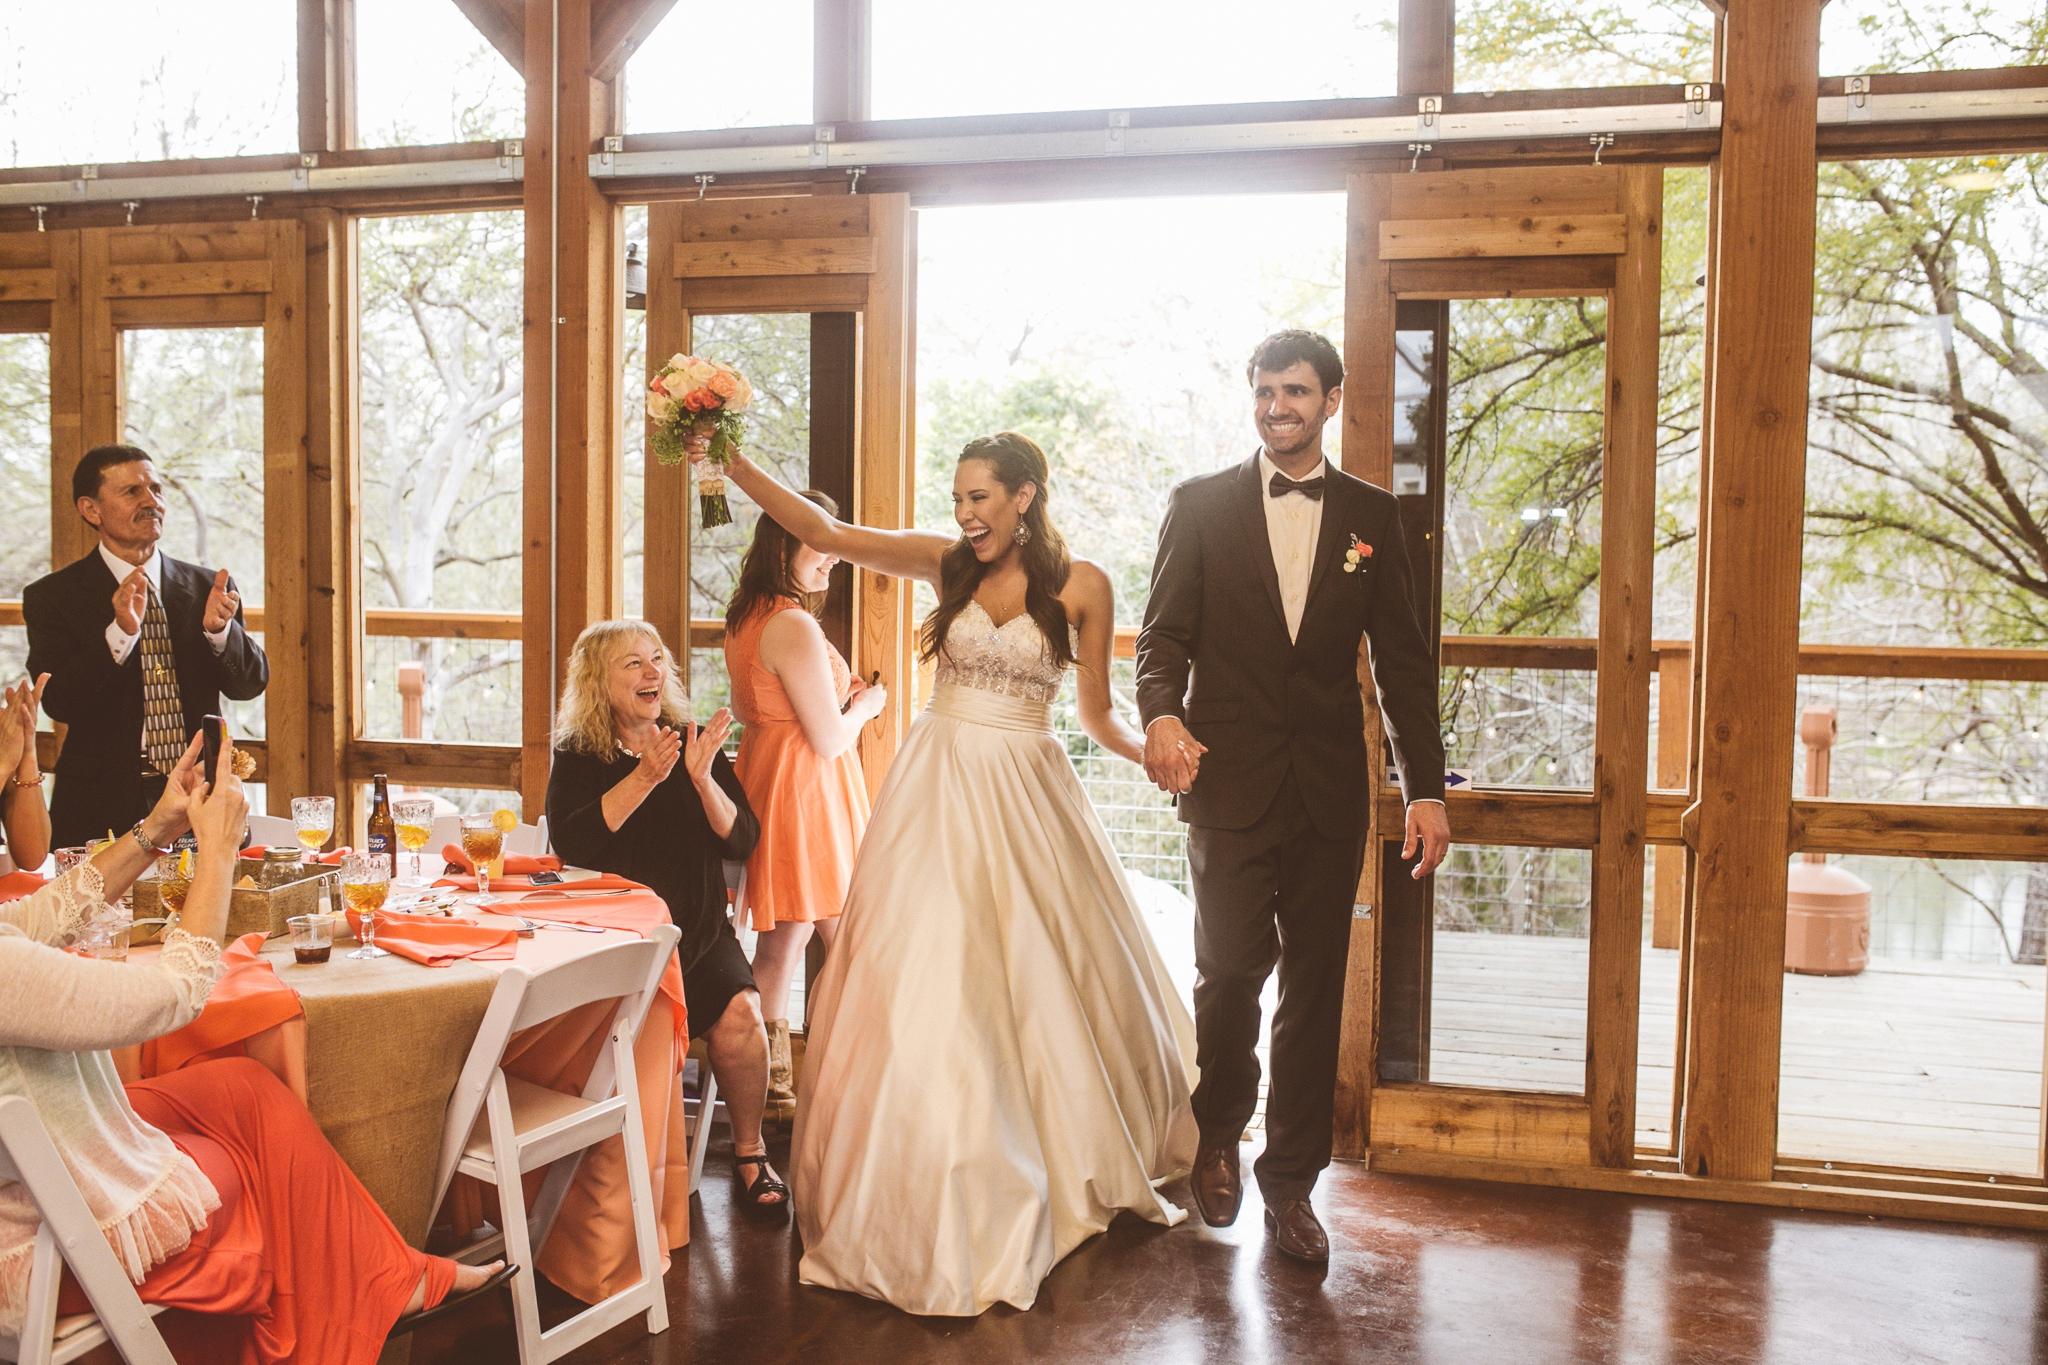 Milltown-Historic-Distric-Wedding-New-Braunfels-032.jpg